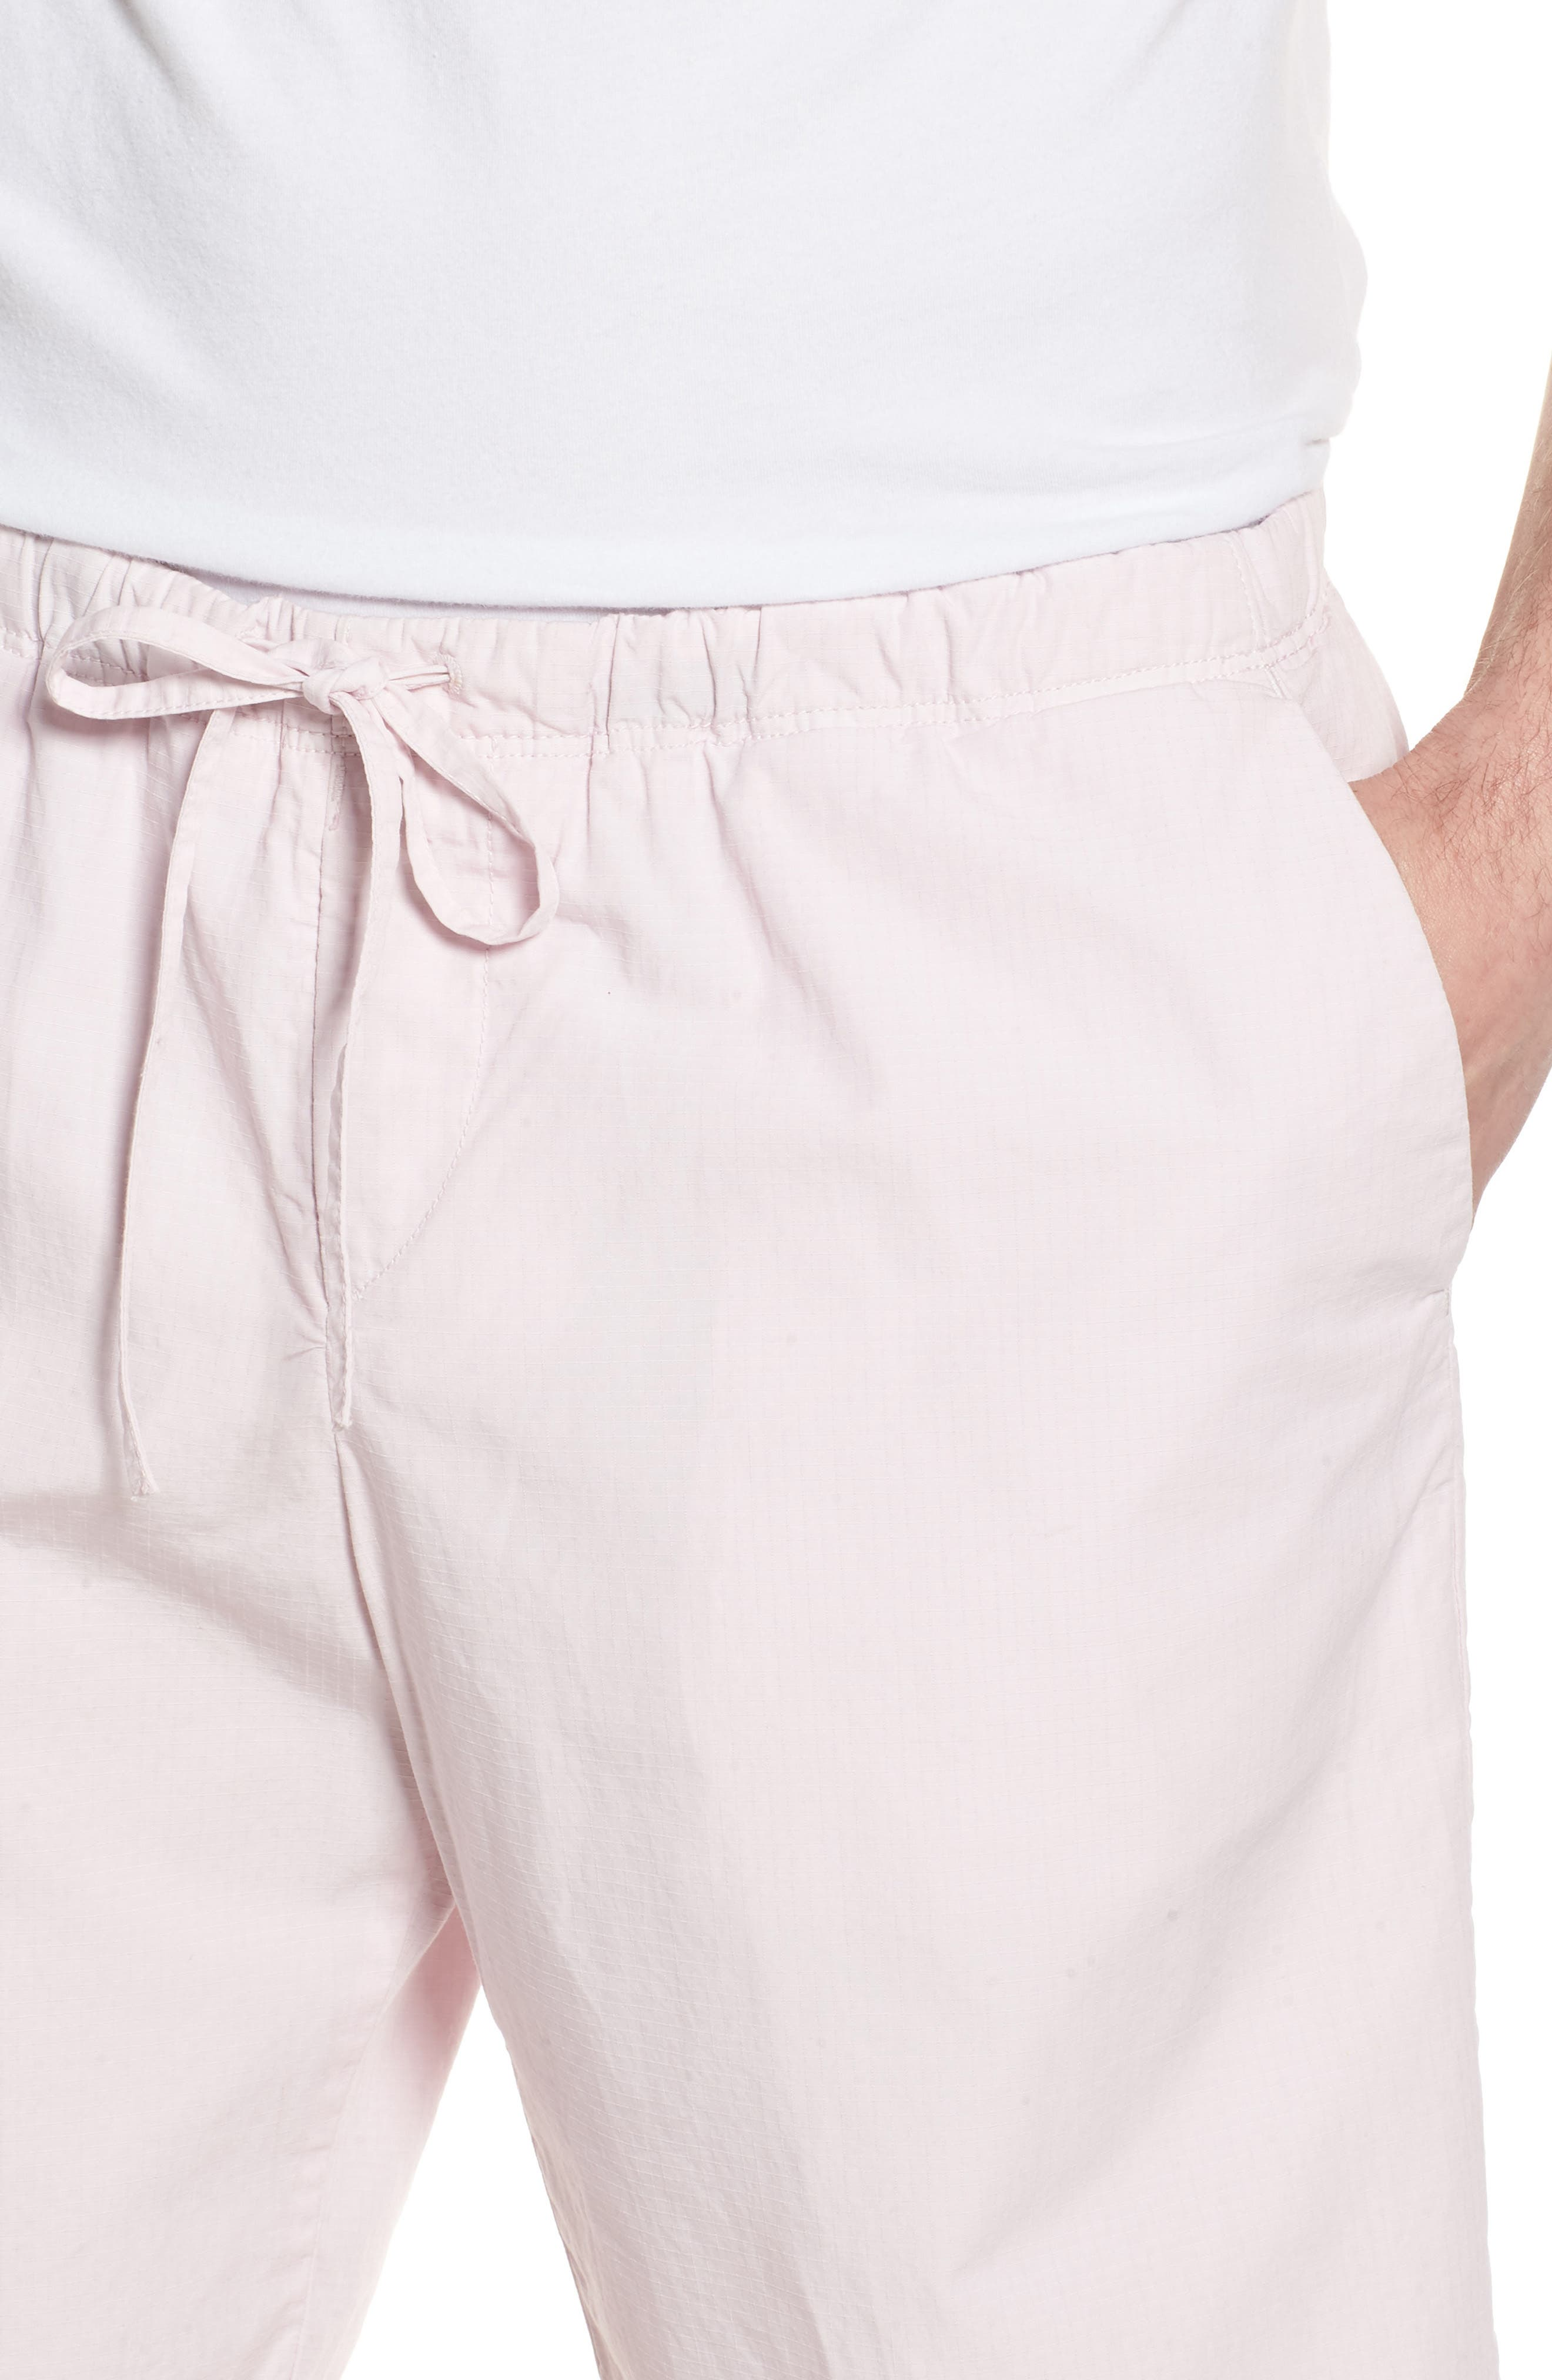 Passeo Cotton Shorts,                             Alternate thumbnail 4, color,                             Pink